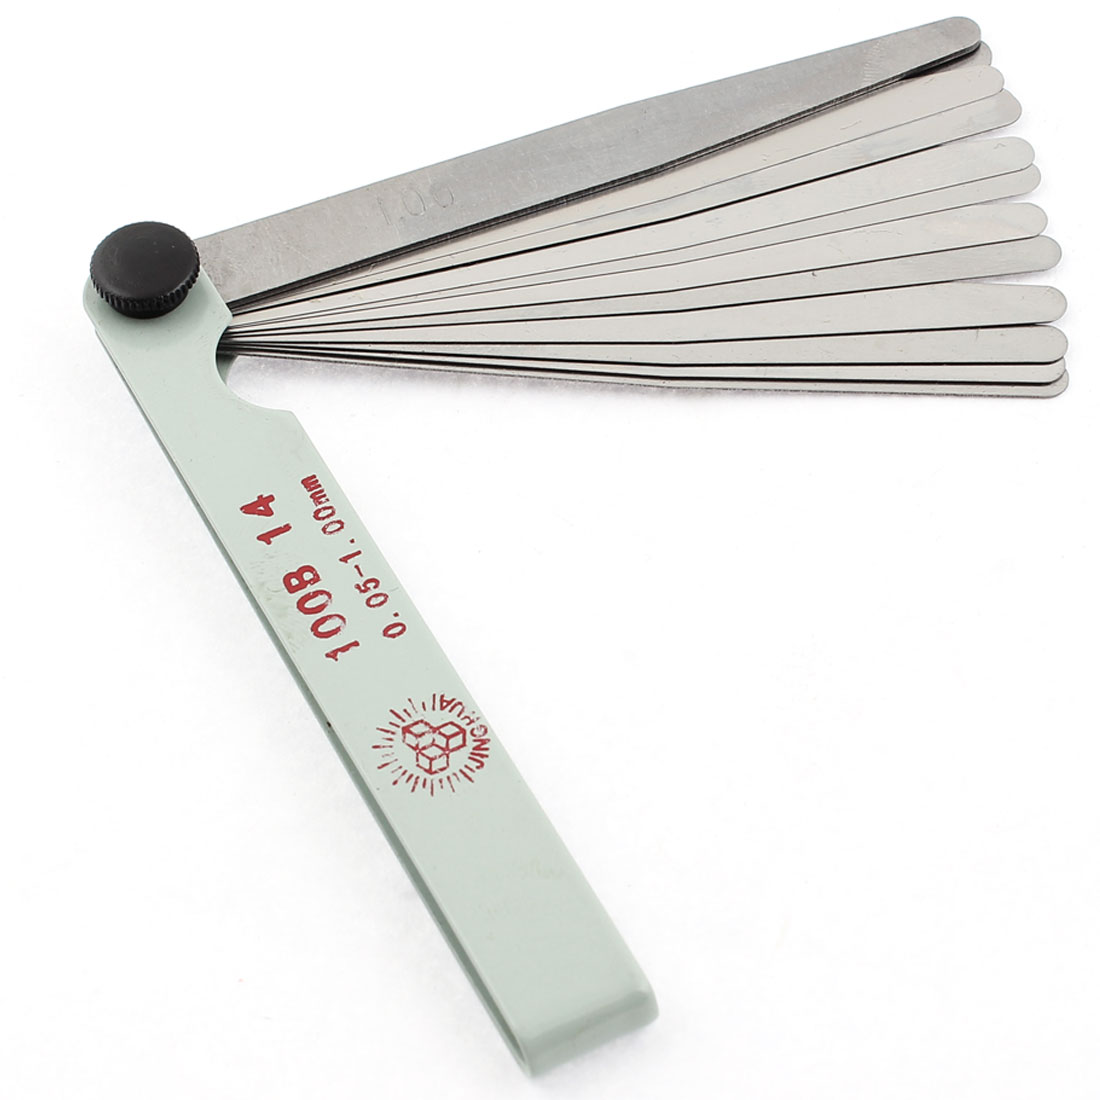 100B-14 0.05-1.00mm Thickness 14 Leave Measuring Tool Feeler Filler Gauge